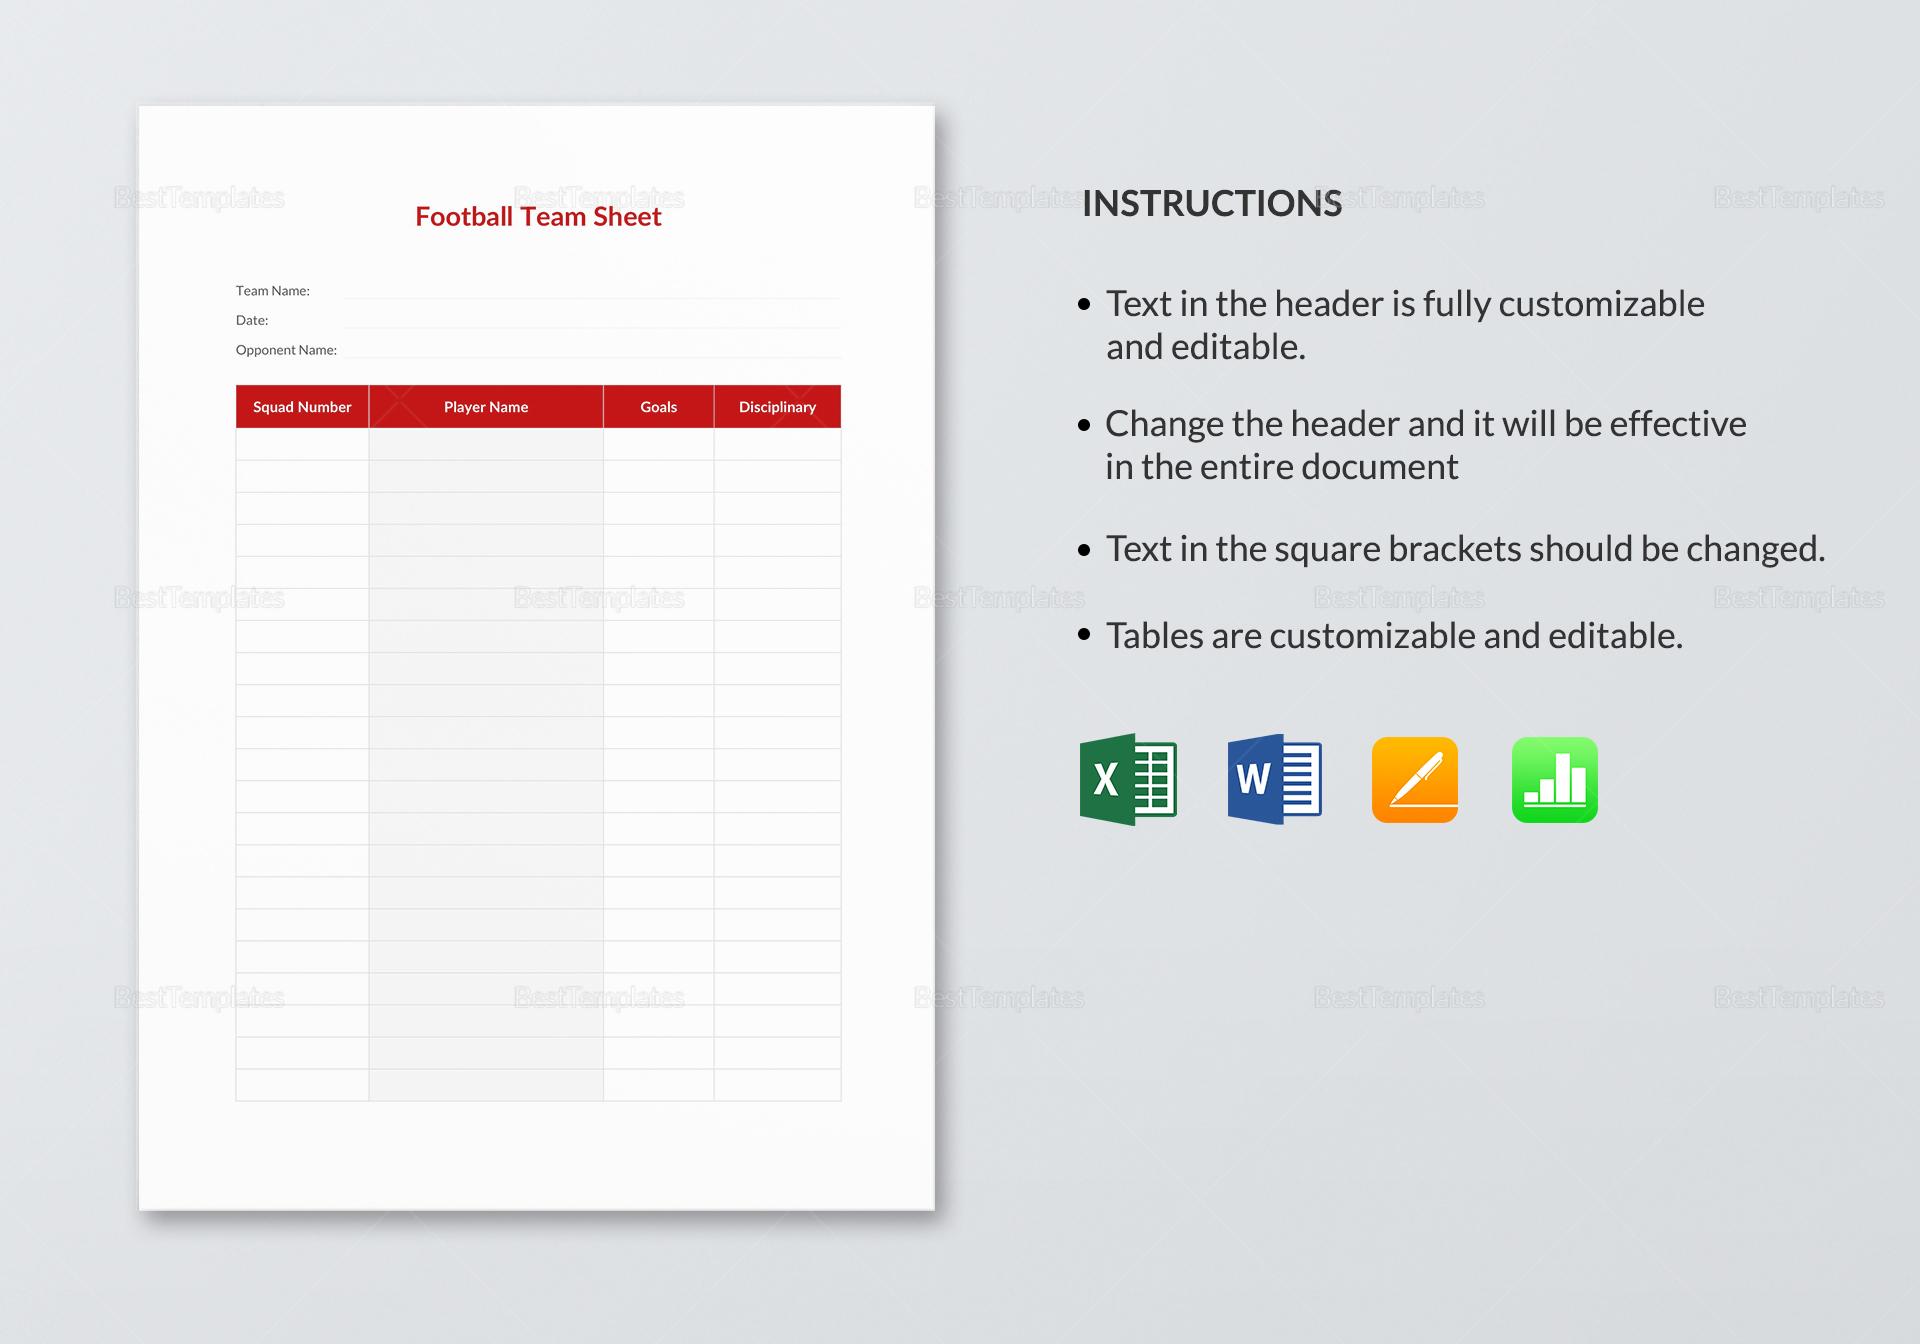 Sample Football Team Sheet Template